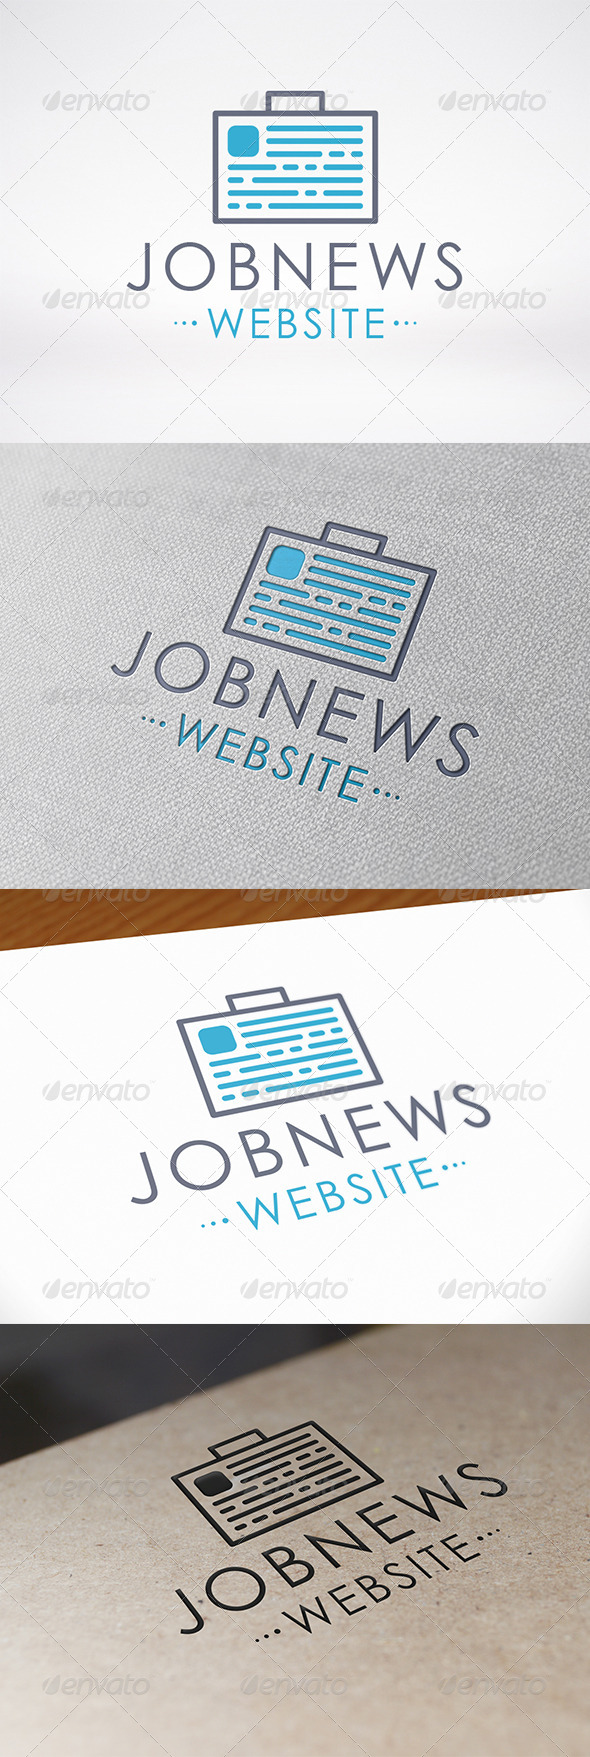 Job News Logo Template - Objects Logo Templates